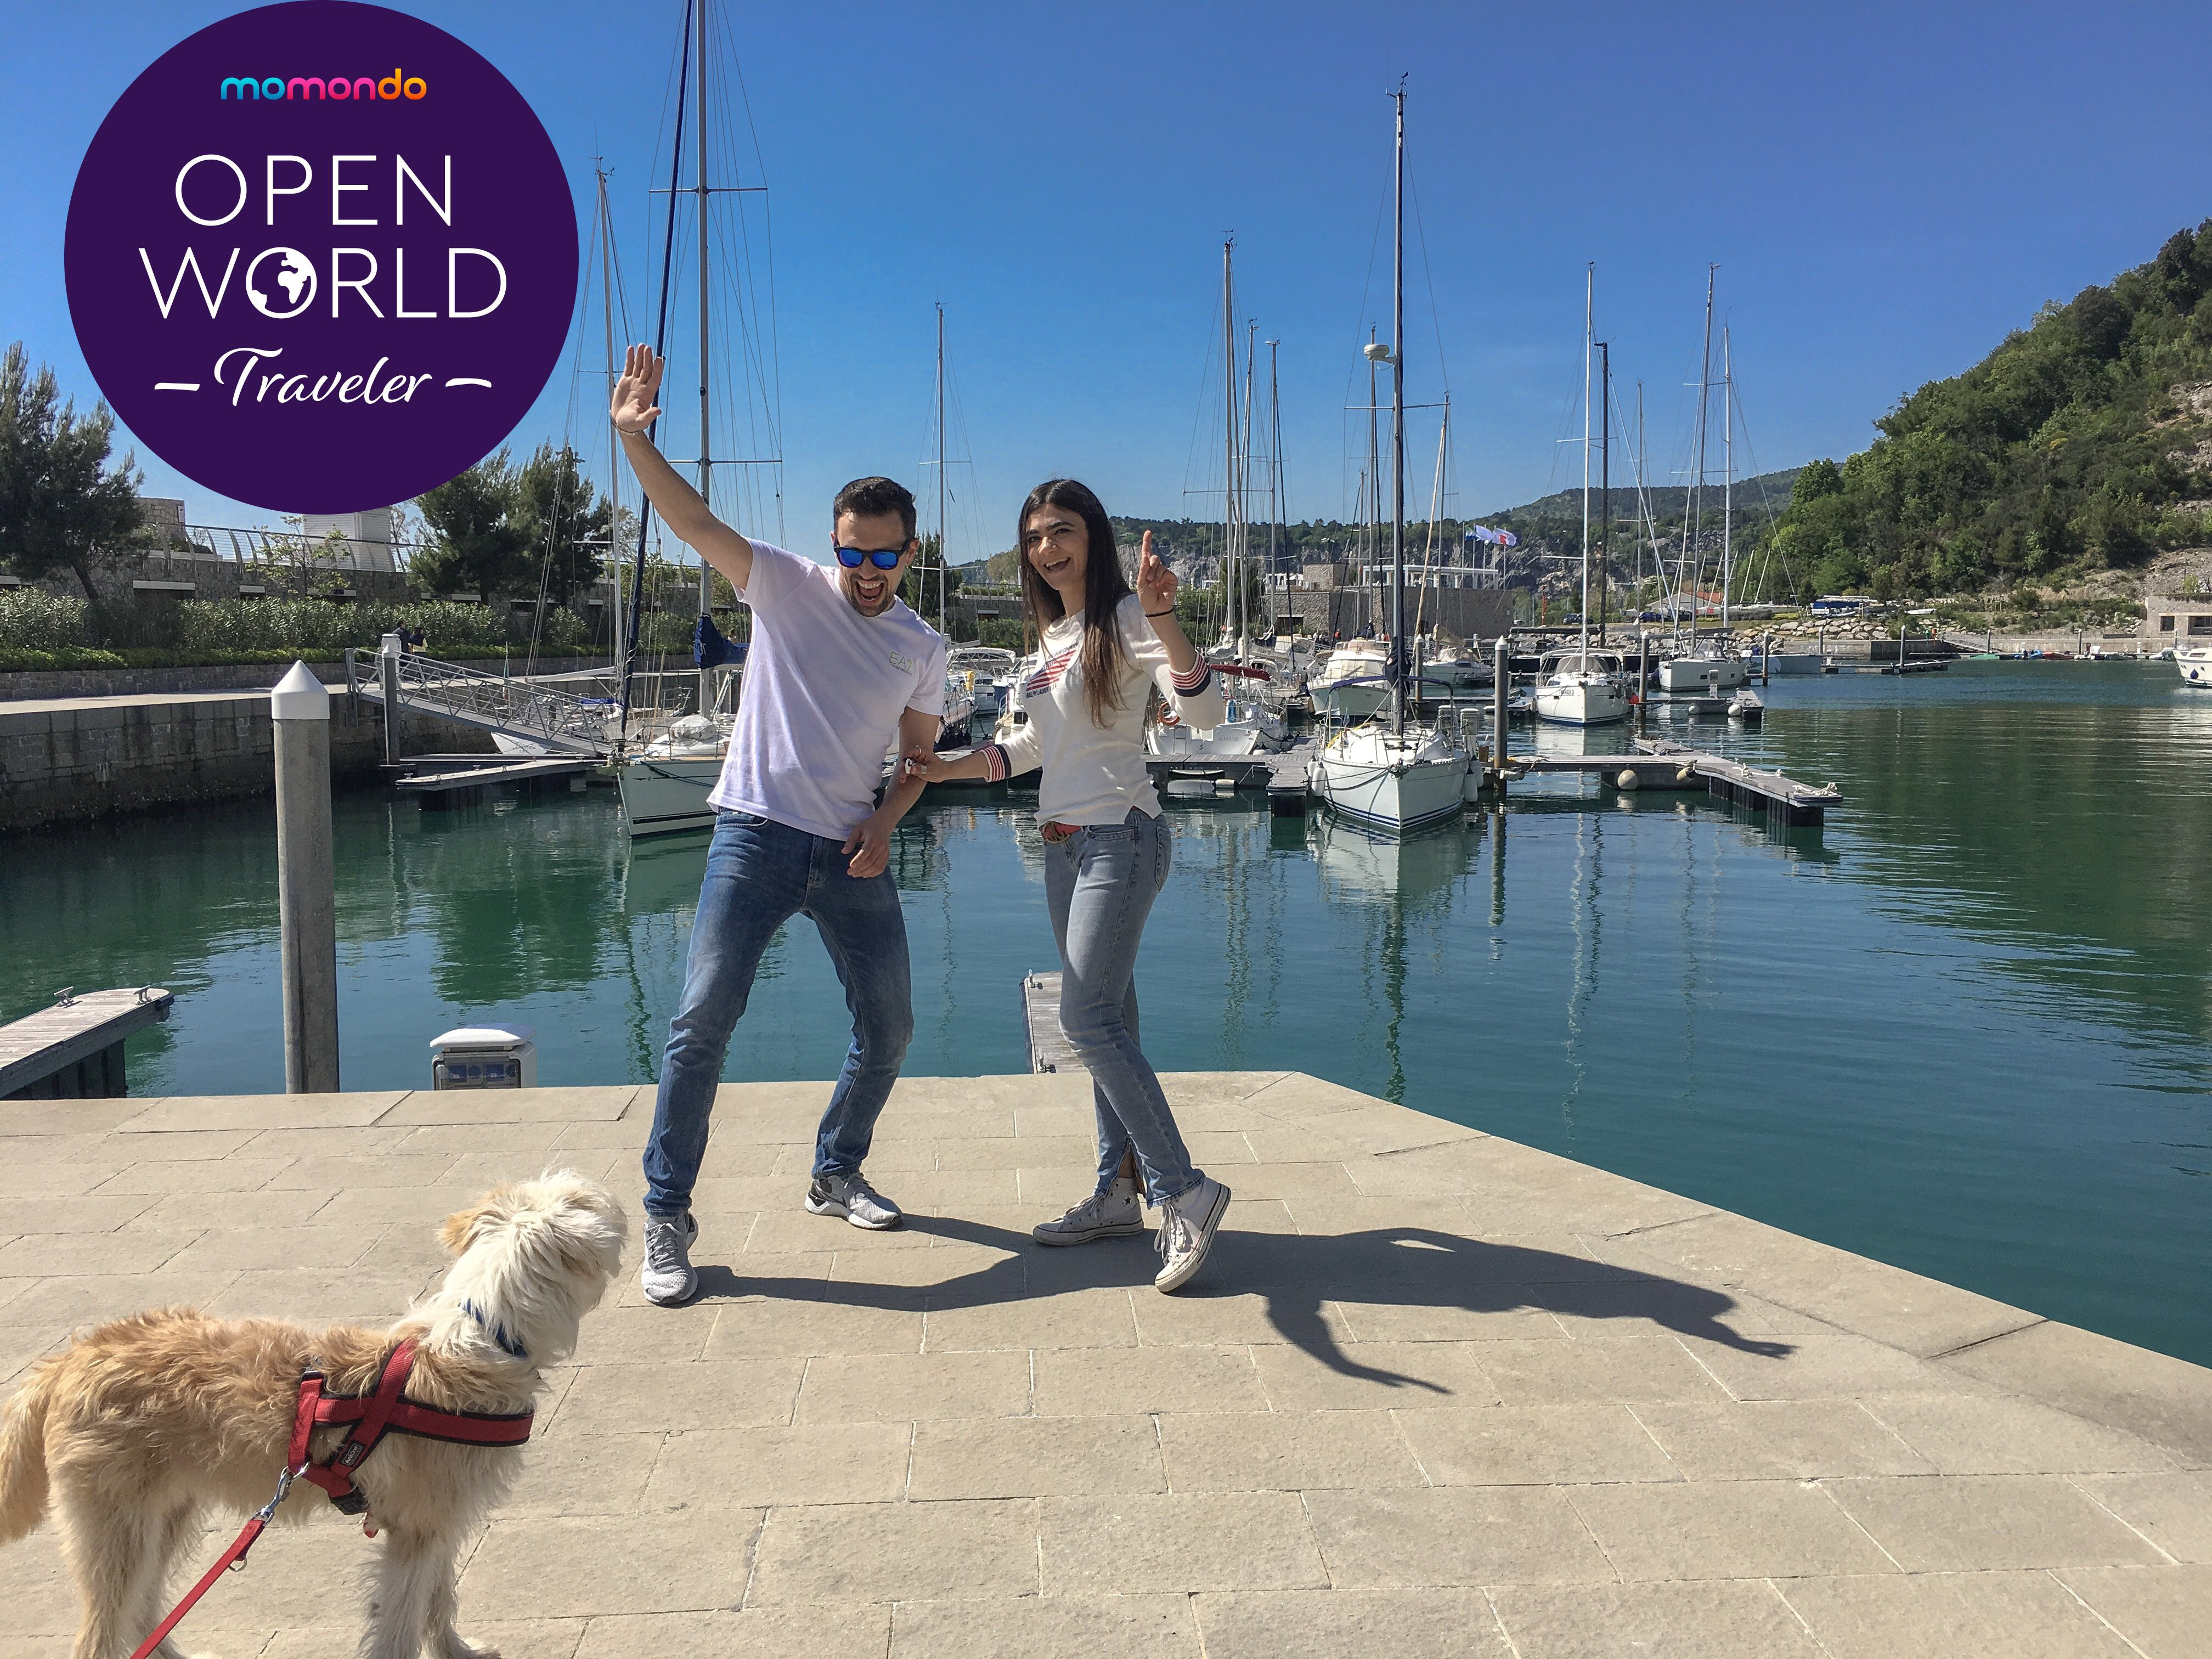 Momondo Ambassador -Open World Travelers